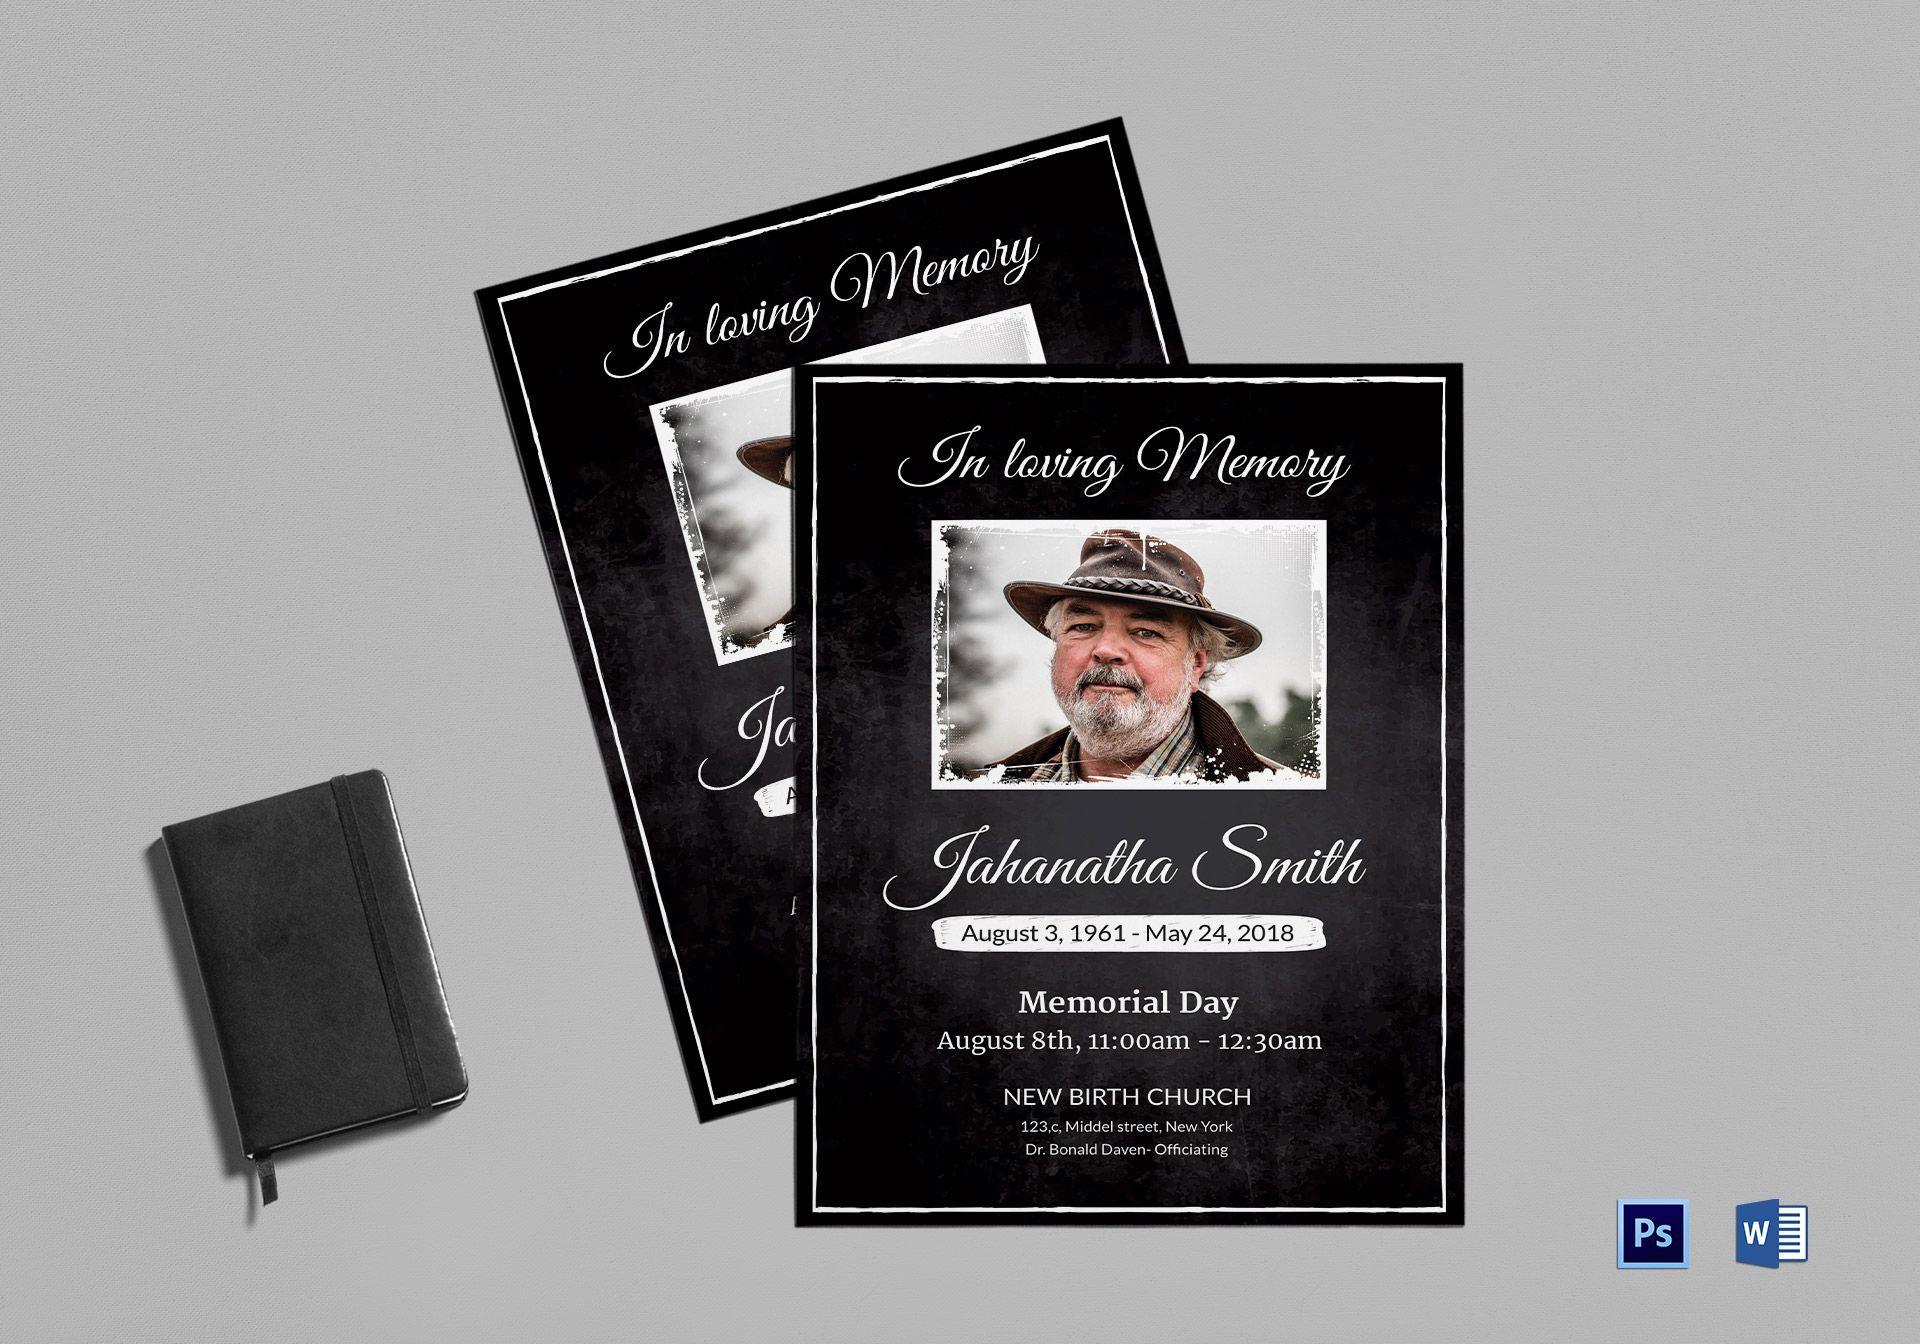 Memorial Bulletin Template Inside Memorial Card Template Word Professional Template Ideas Memorial Cards Card Template Teacher Cards